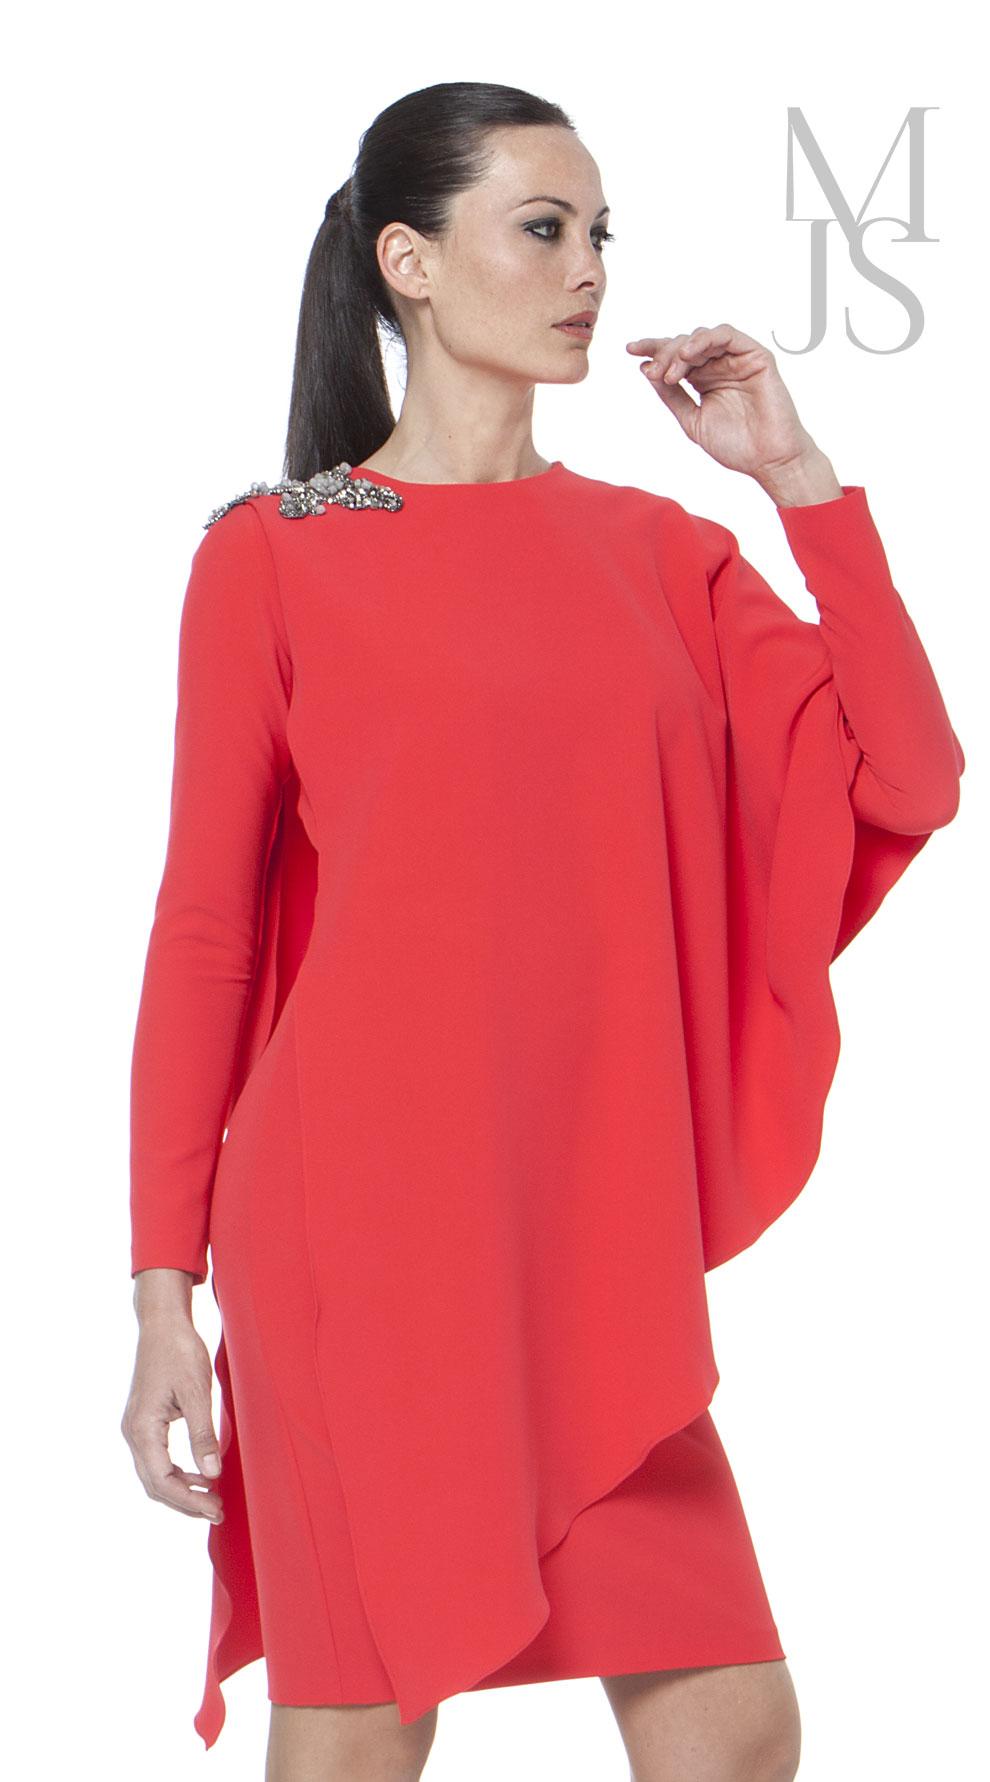 Poiret dress - María José Suárez